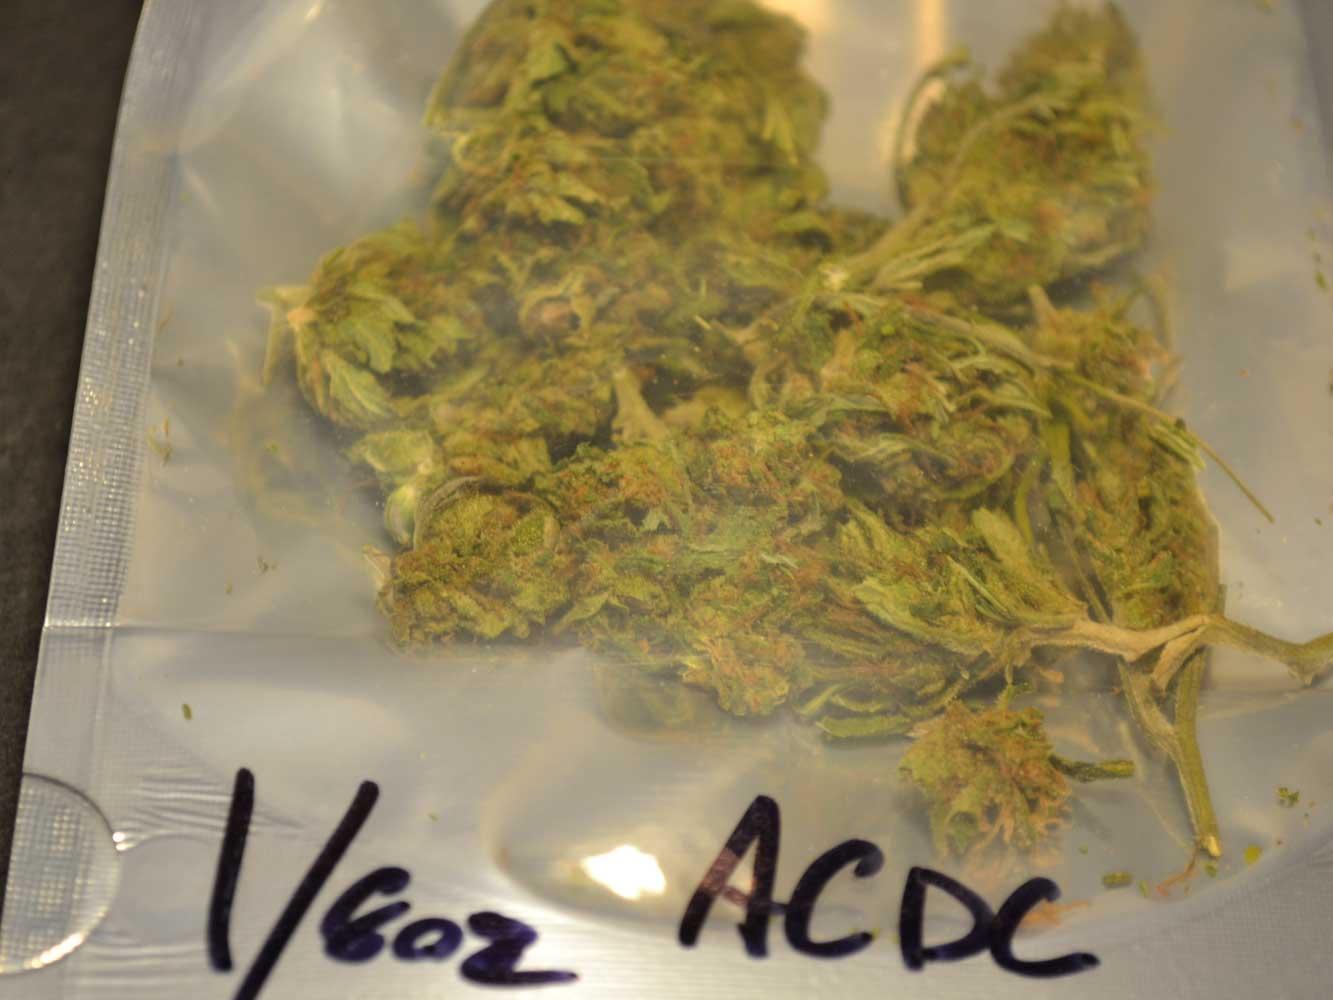 AC/DC CBD Flower / hemp from Tweedle Farms